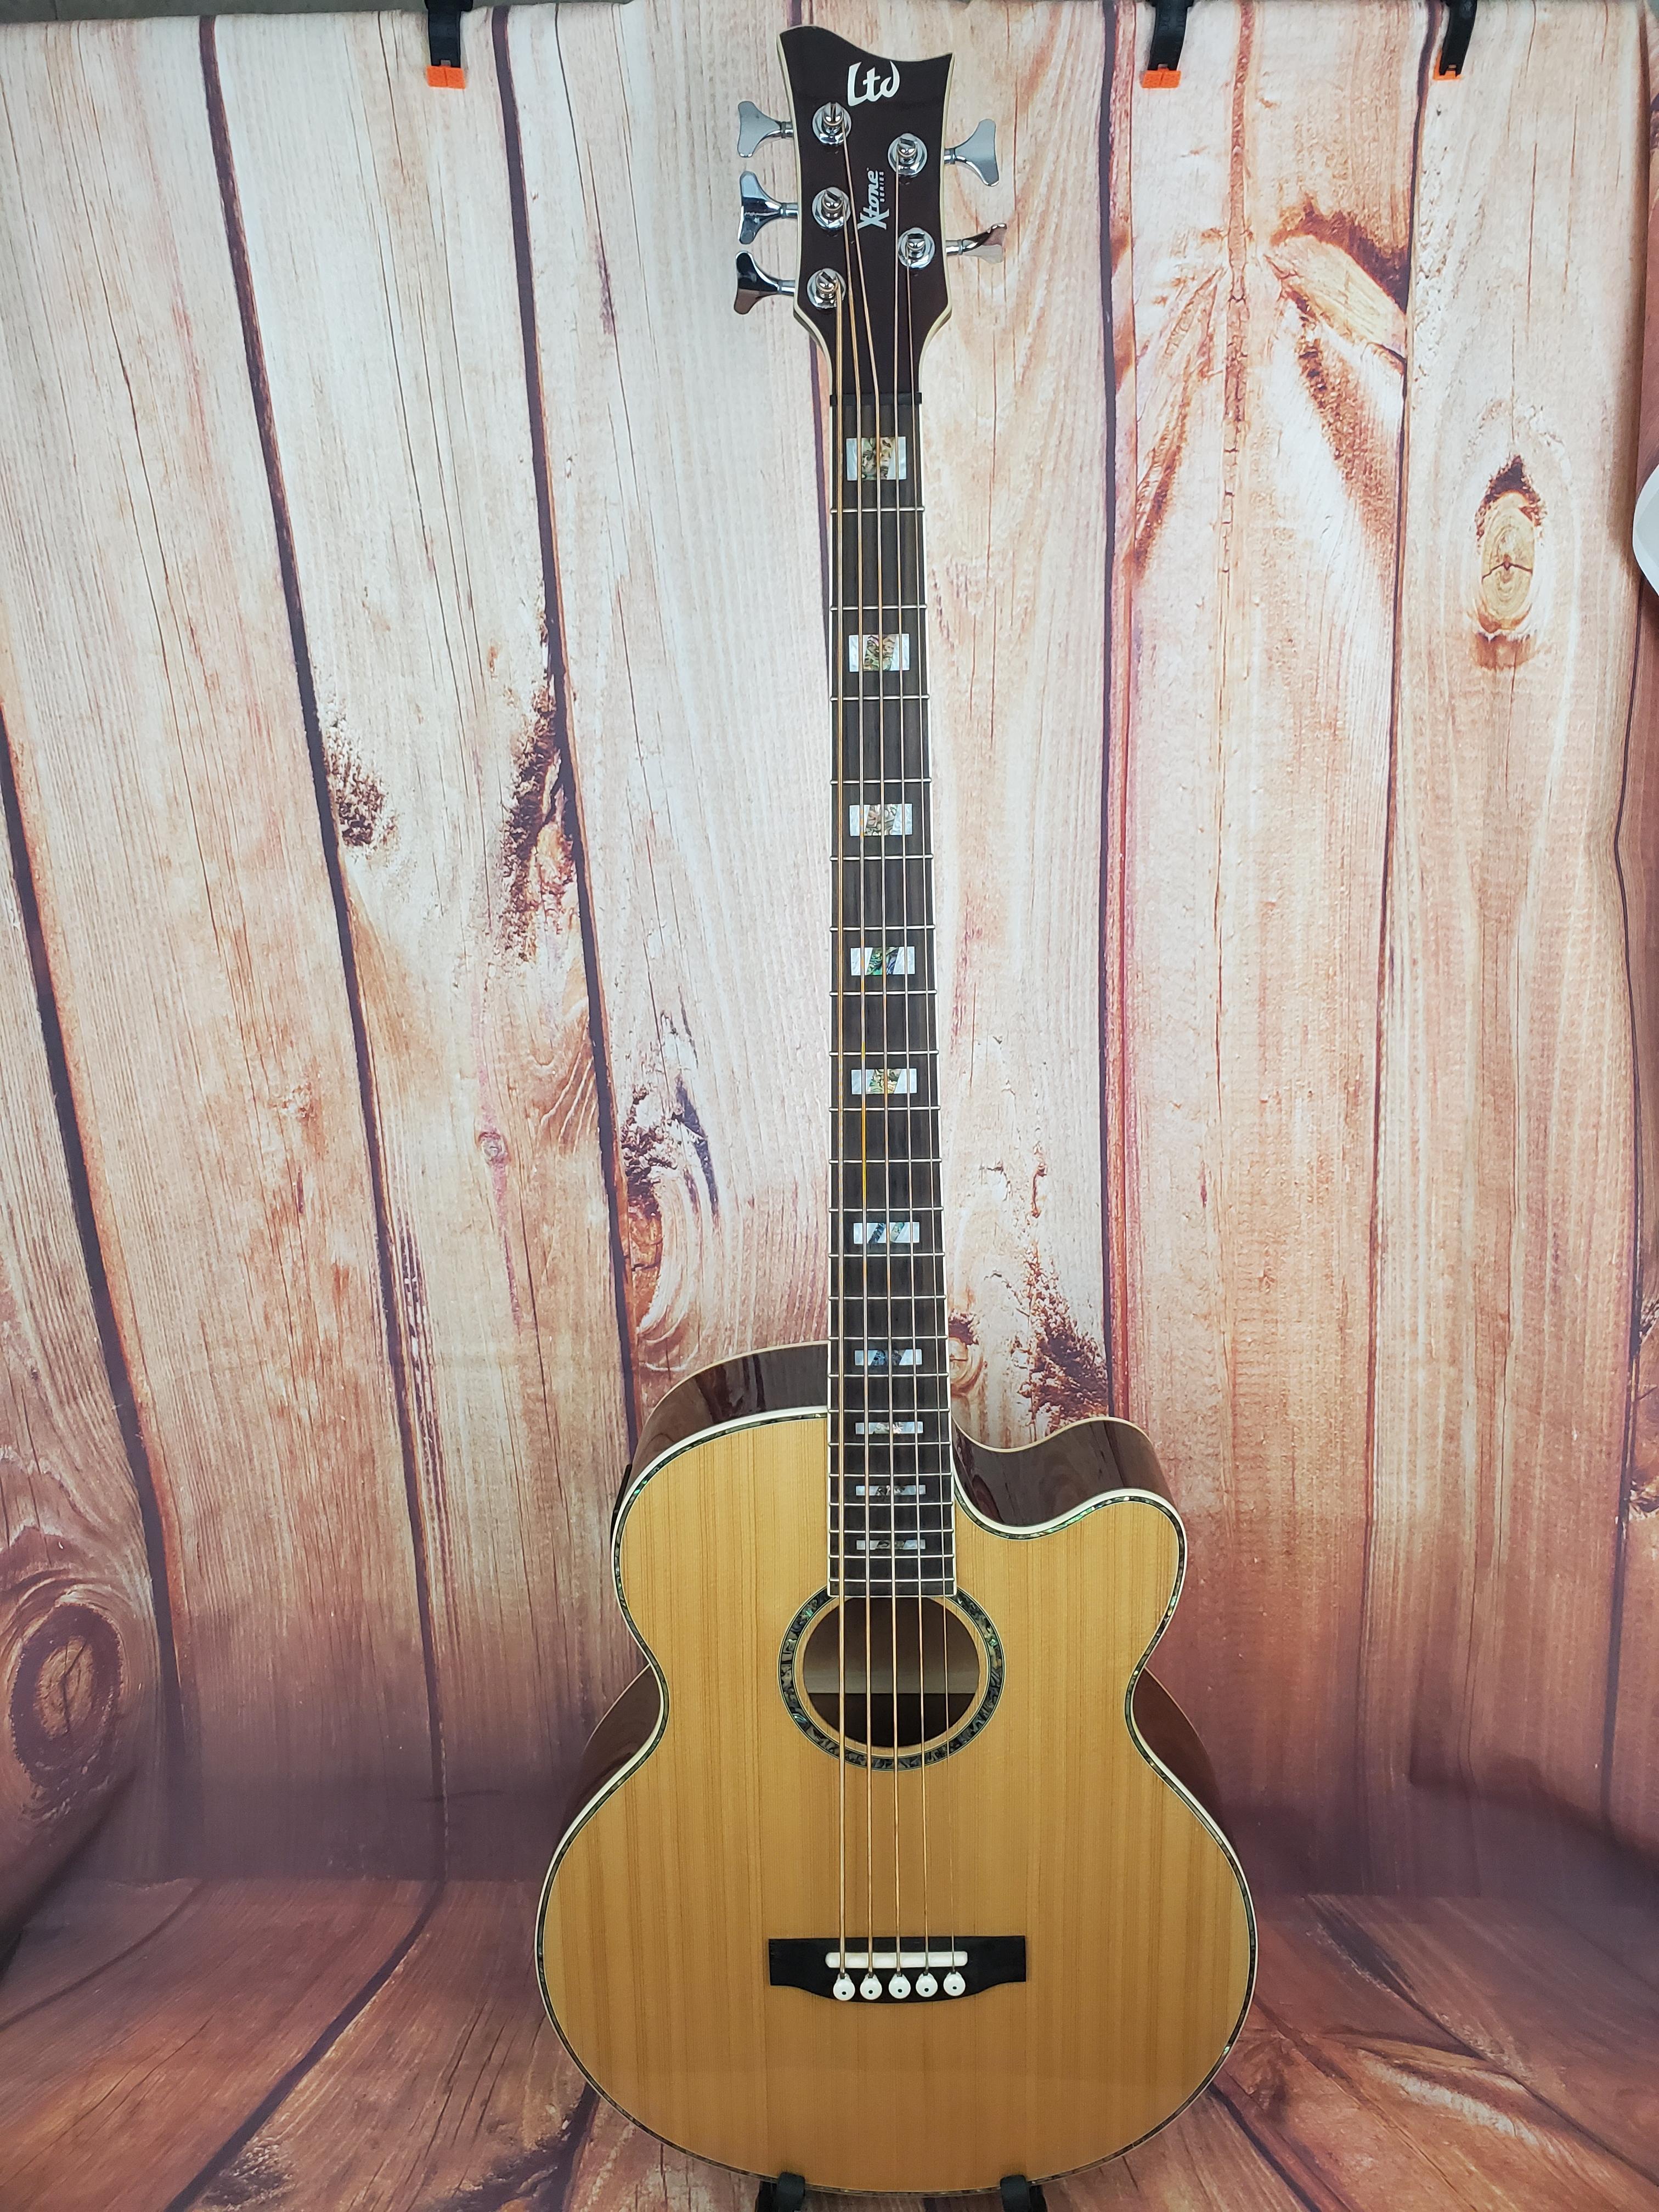 Used- ESP LTD LAC-B5S Acoustic Bass w/ Bag